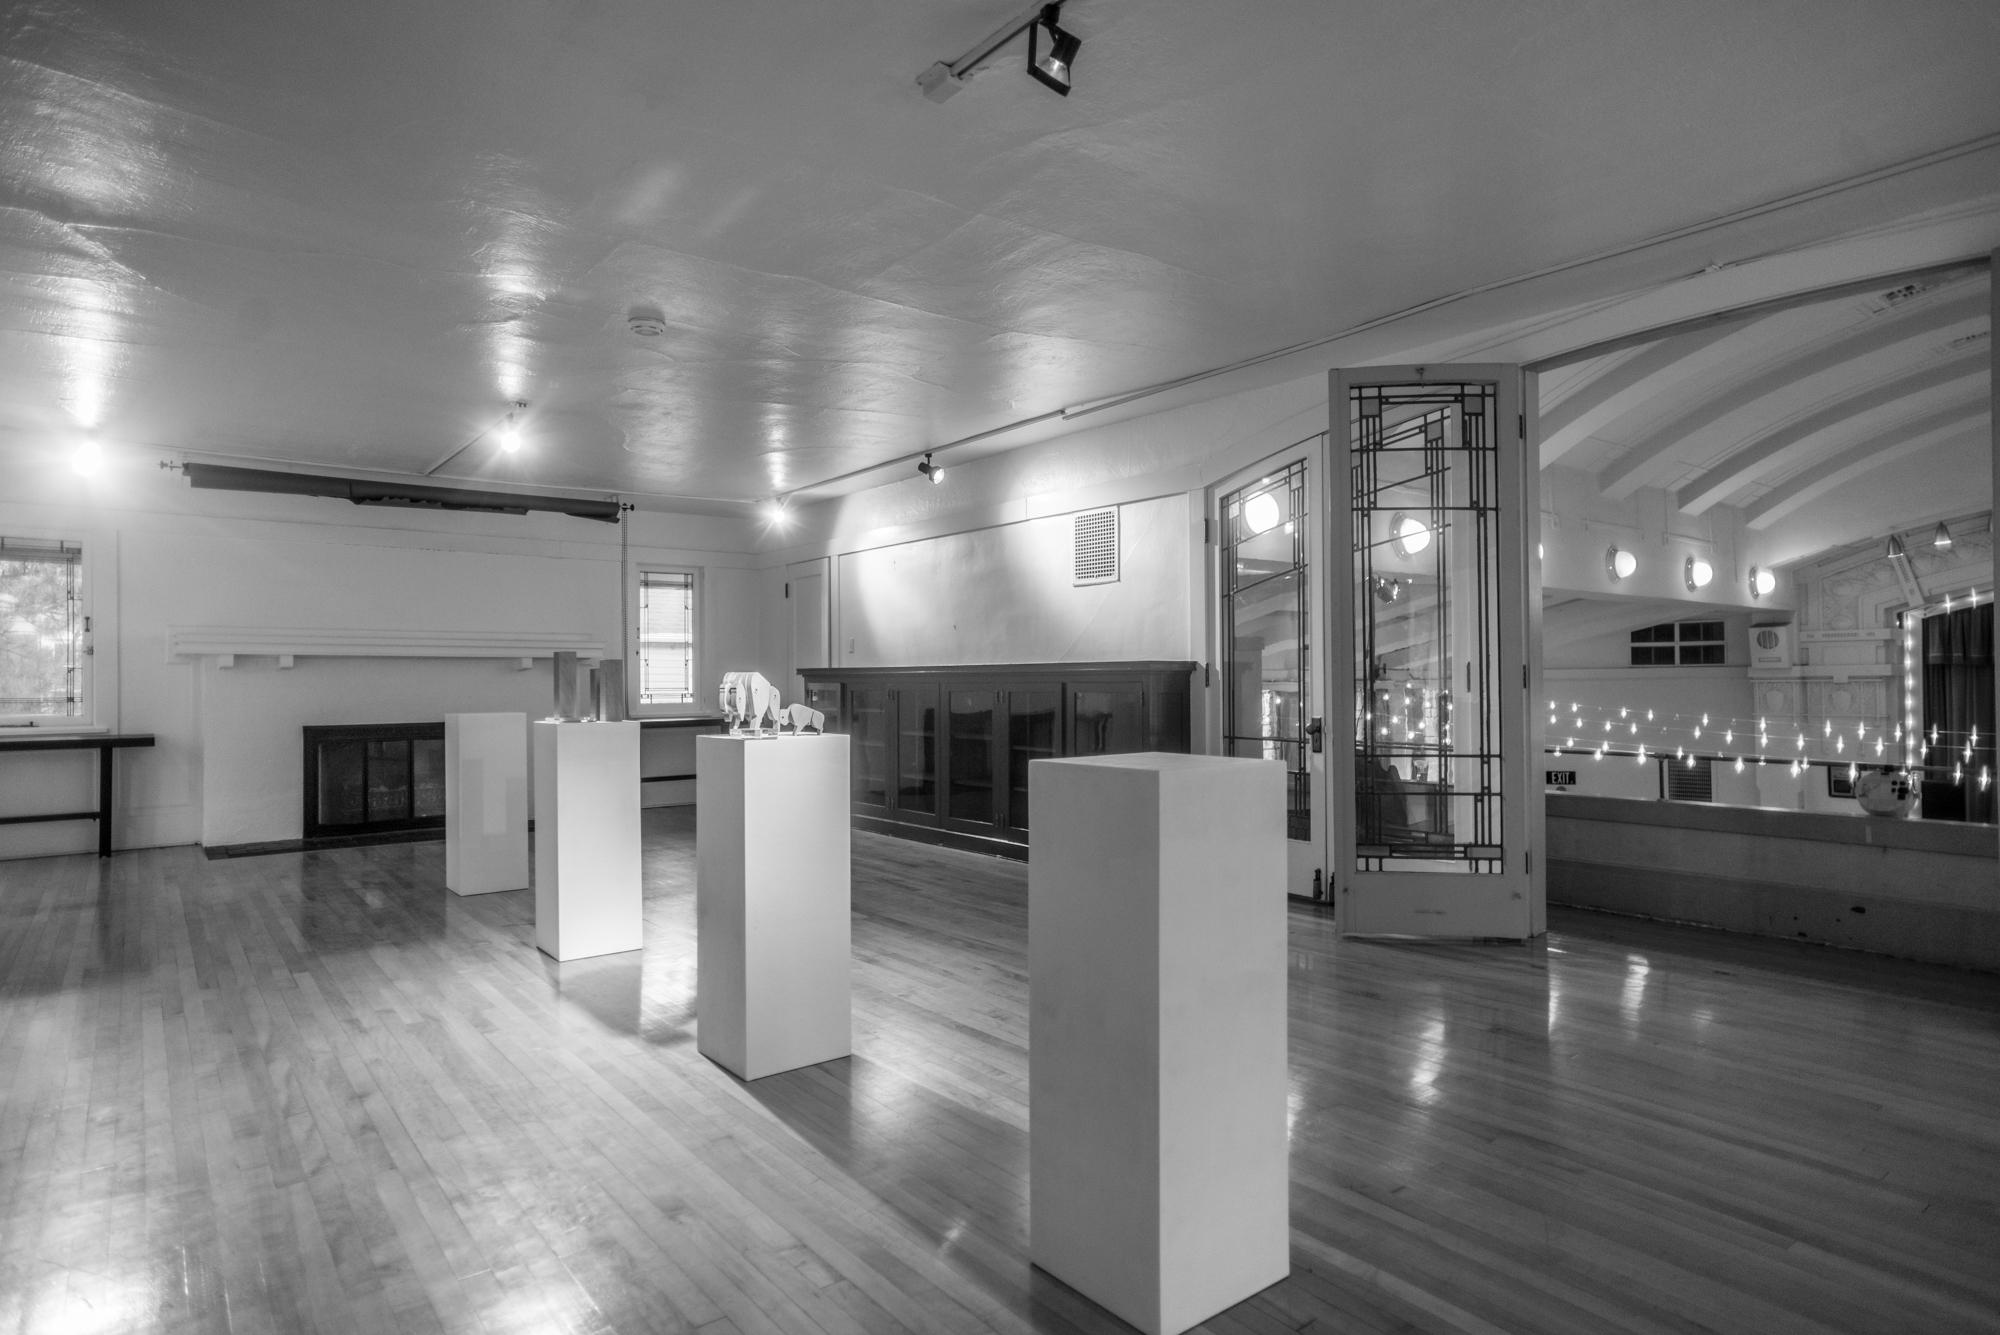 2018.10.5_FurnitureDesignShowcase@ClubhouseSLC-11.jpg